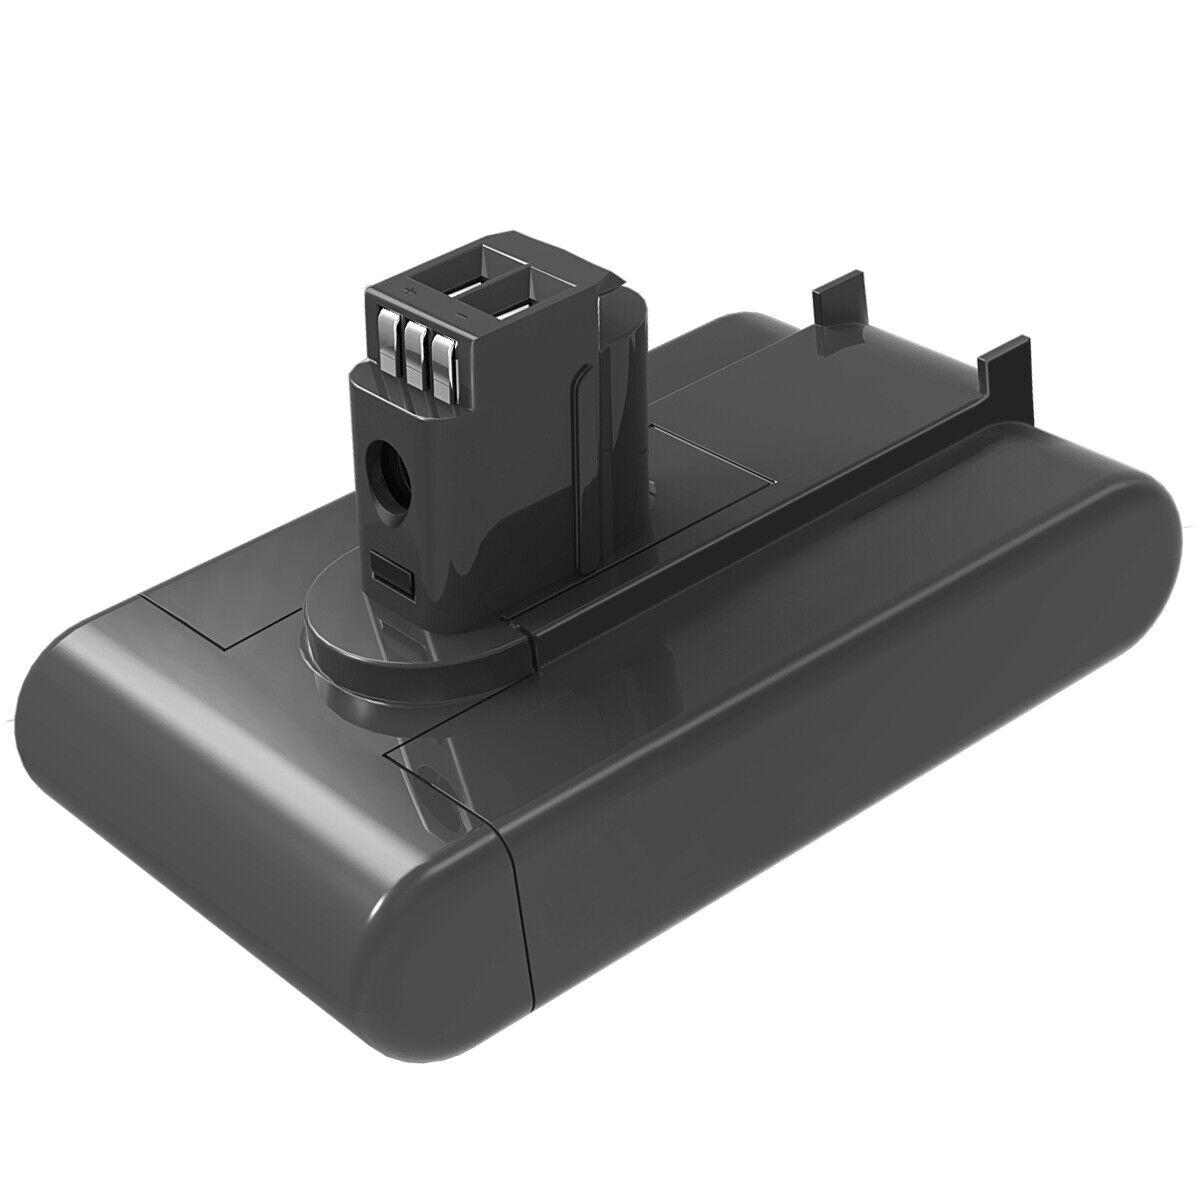 Battery dyson dc31 фильтр dyson